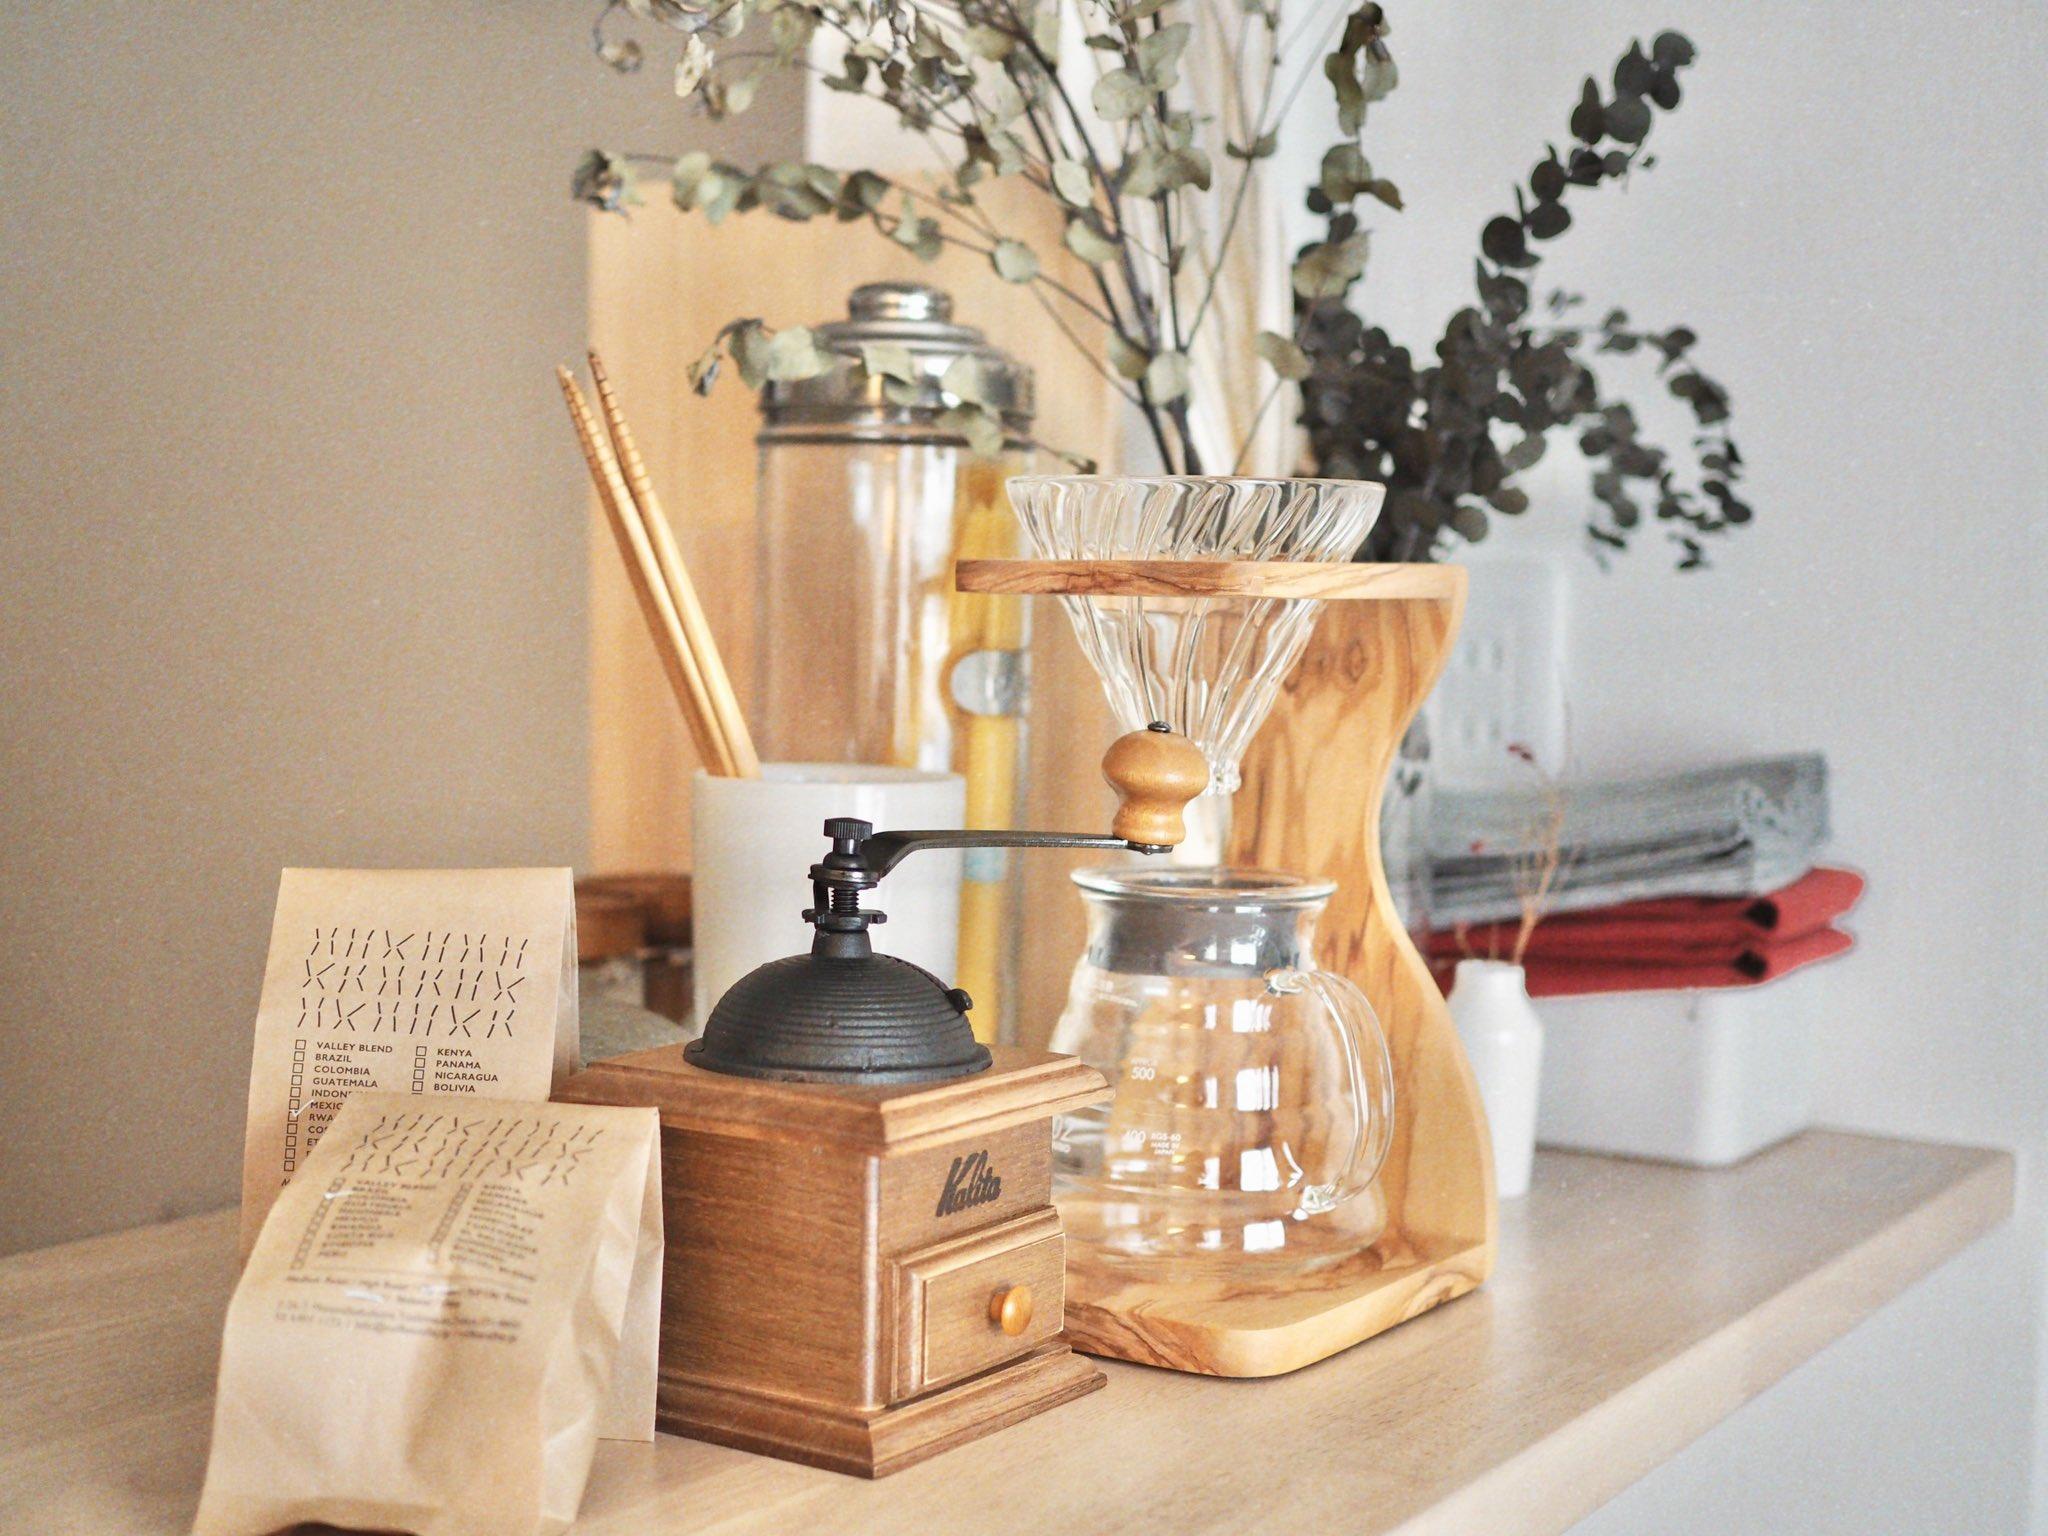 (Kalitaのコーヒーミルと、スタンドのセット/約6,000円